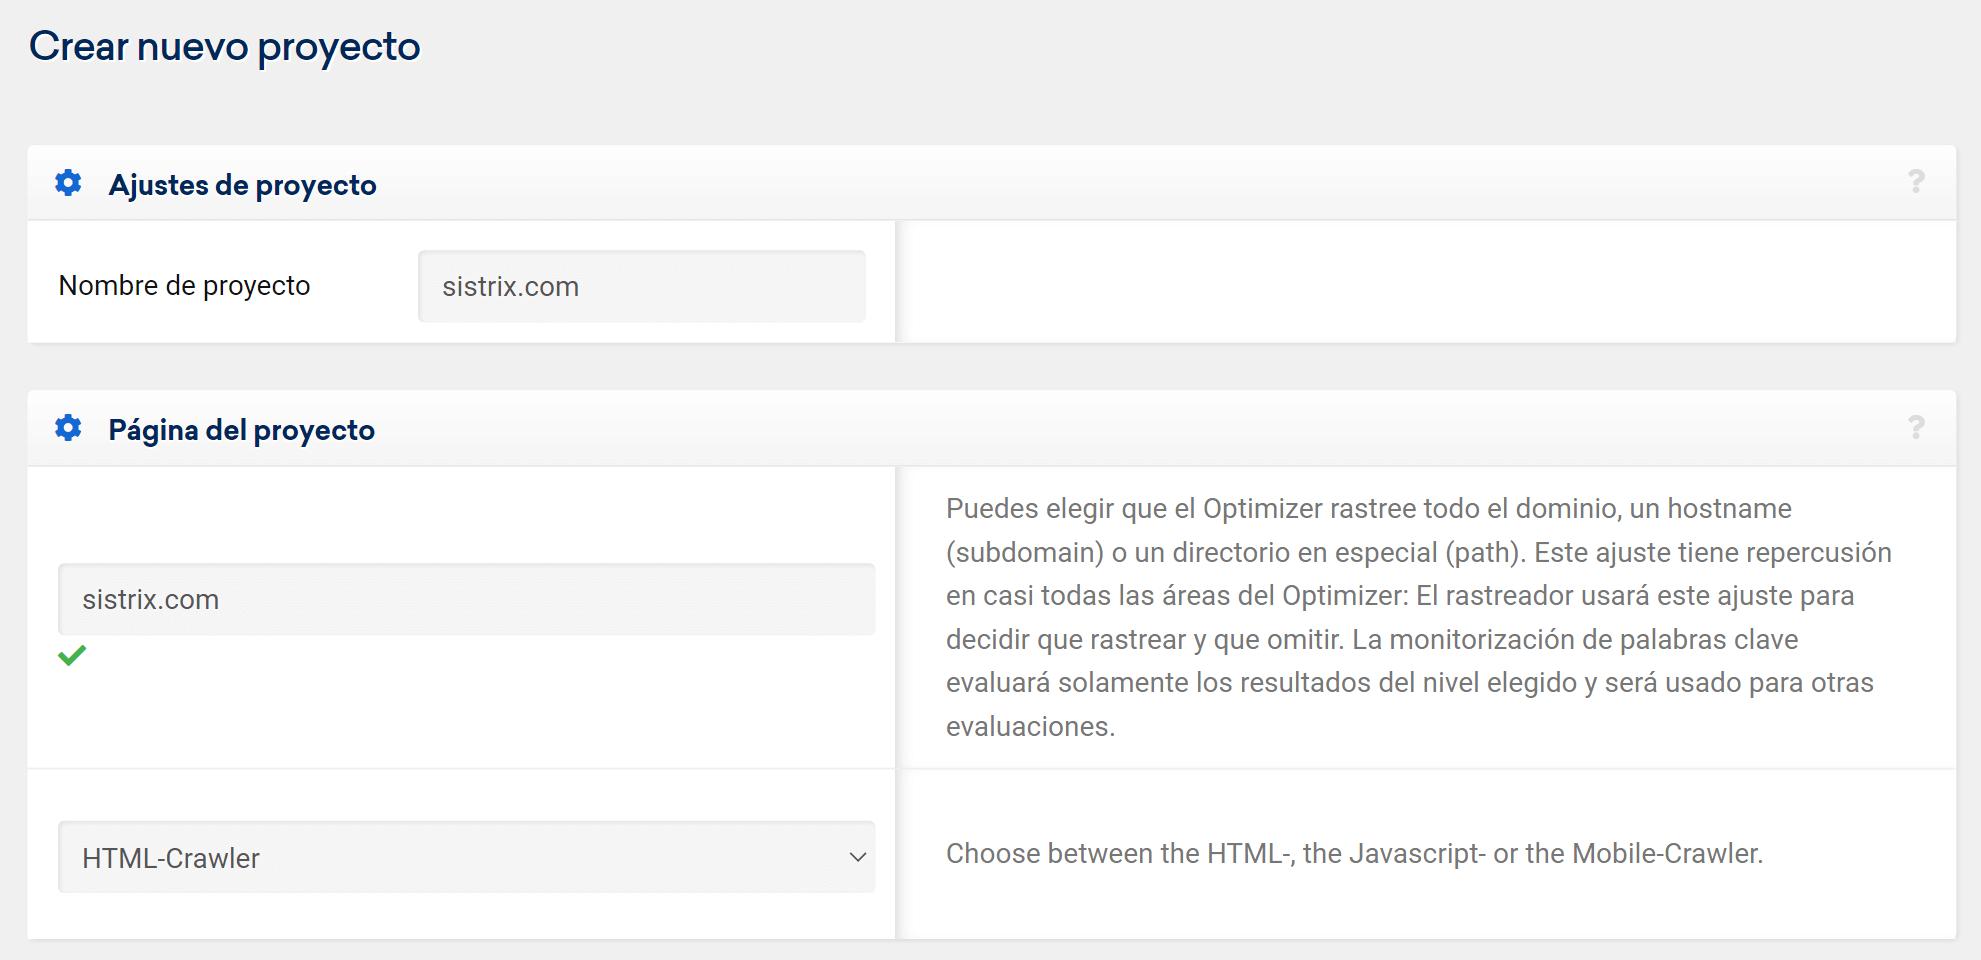 Nombrar proyecto Optimizer de SISTRIX